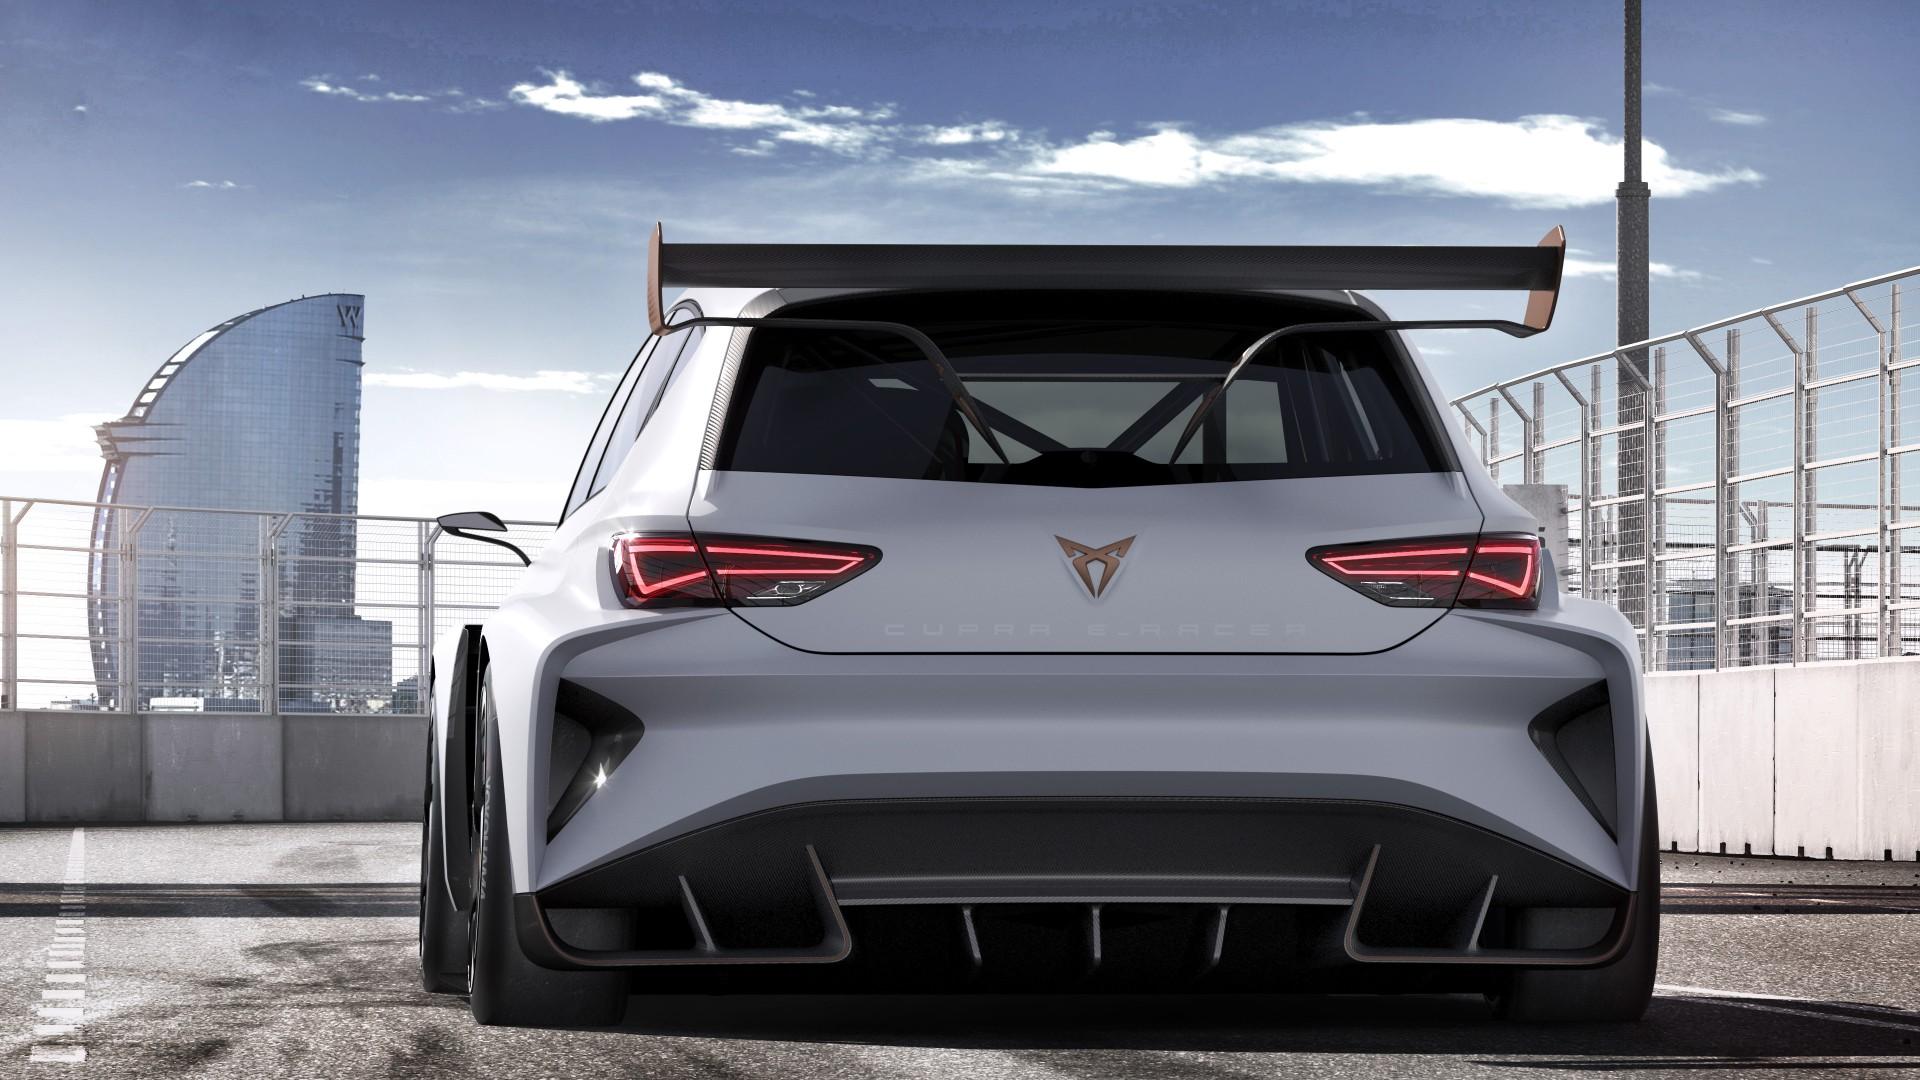 Wallpaper Seat Cupra E Racer Electric Car 4k Cars